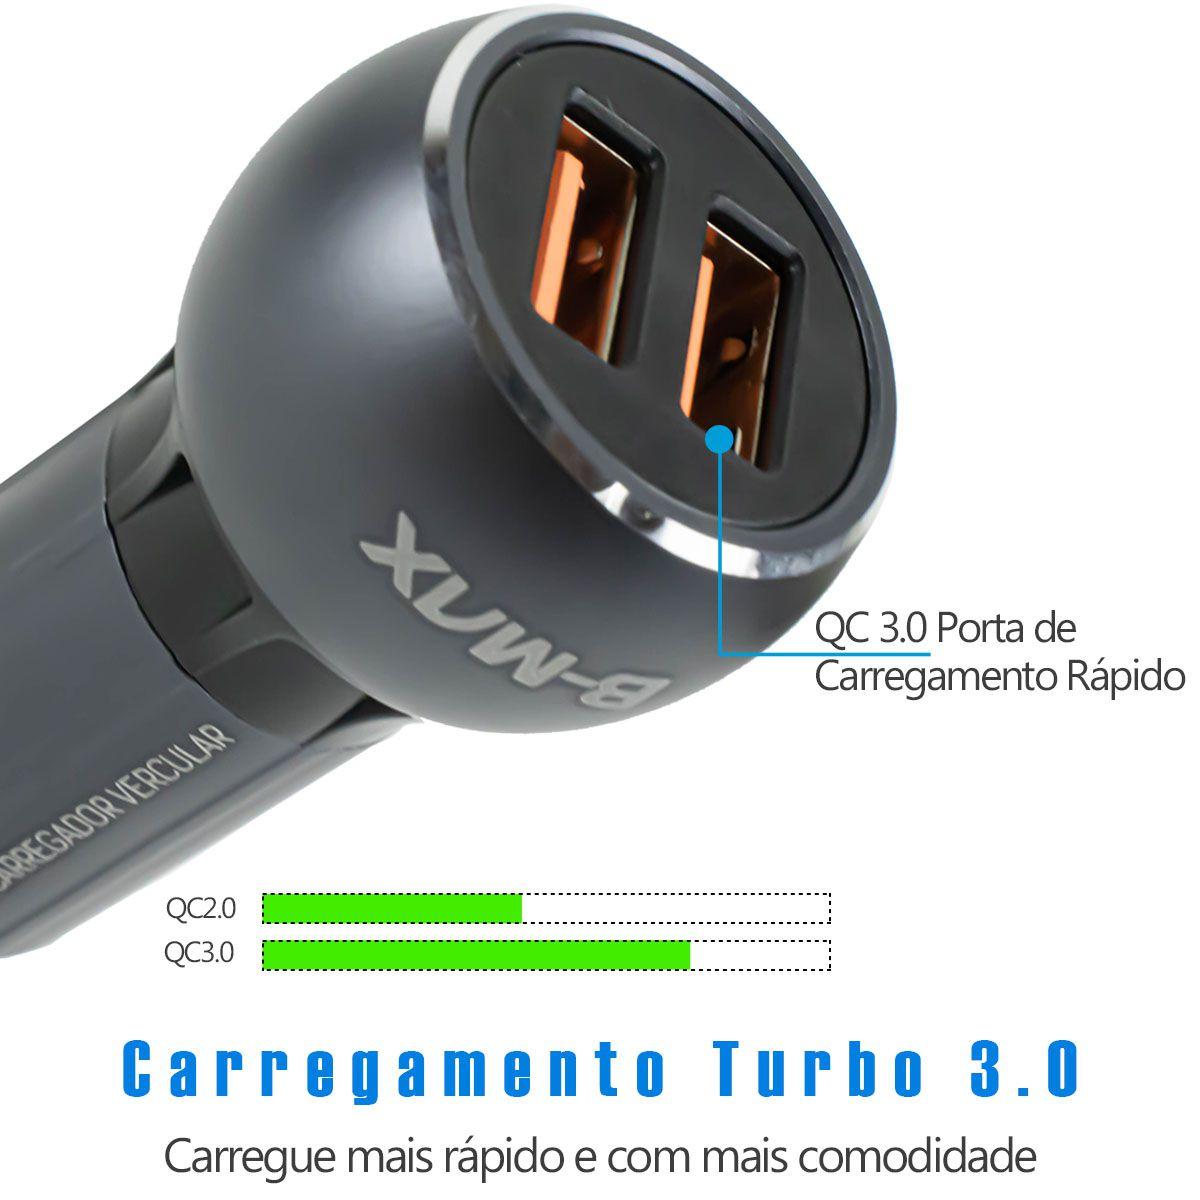 KIT 10x Carregador Veicular Turbo Quick Charge 3.0 36w para Celular Micro Usb V8 B-Max BM8610